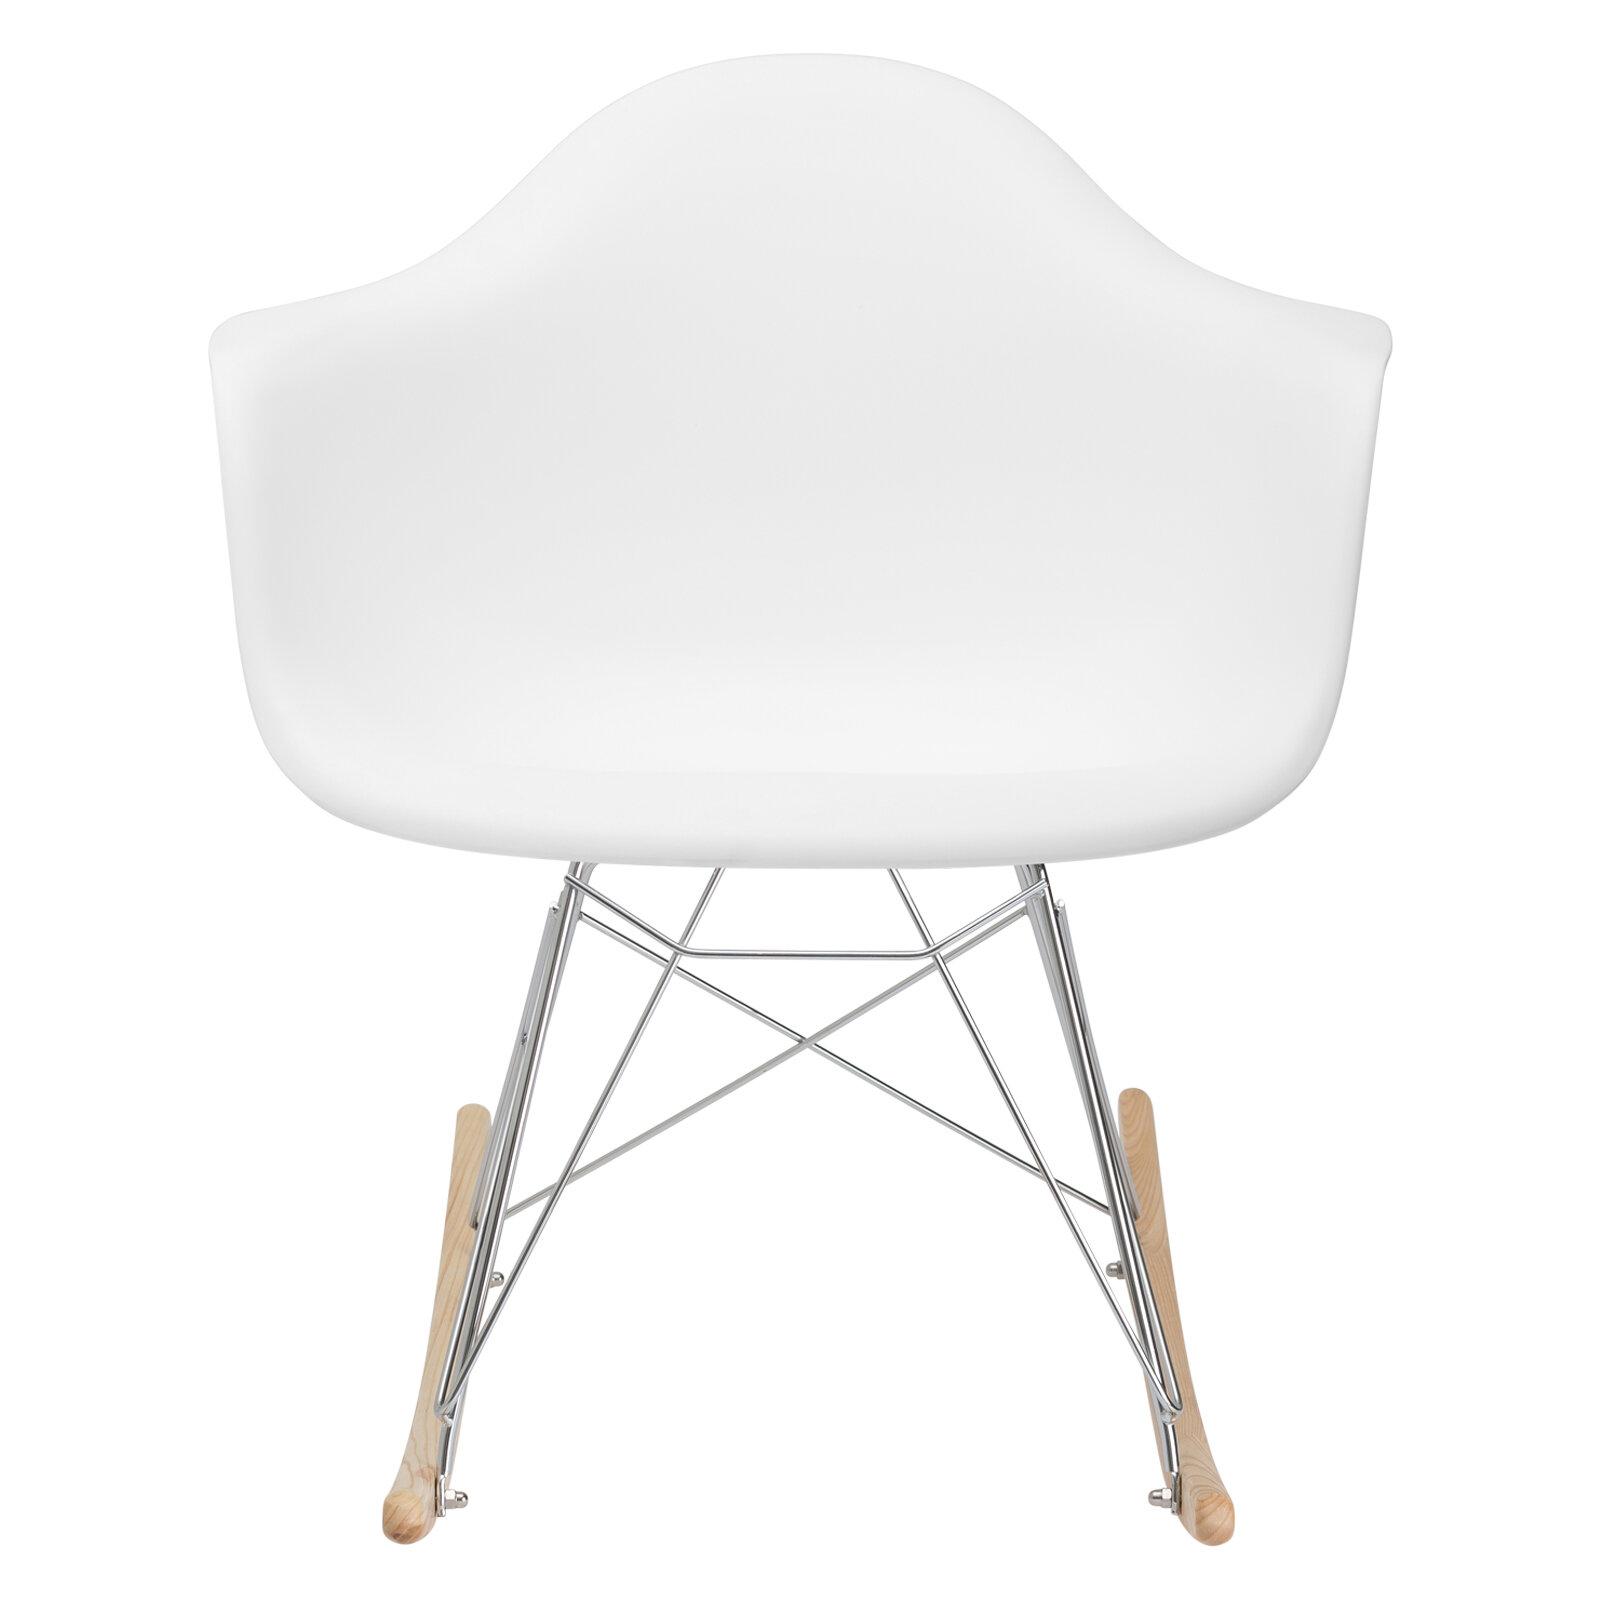 Strange Alfson Rocking Chair Creativecarmelina Interior Chair Design Creativecarmelinacom